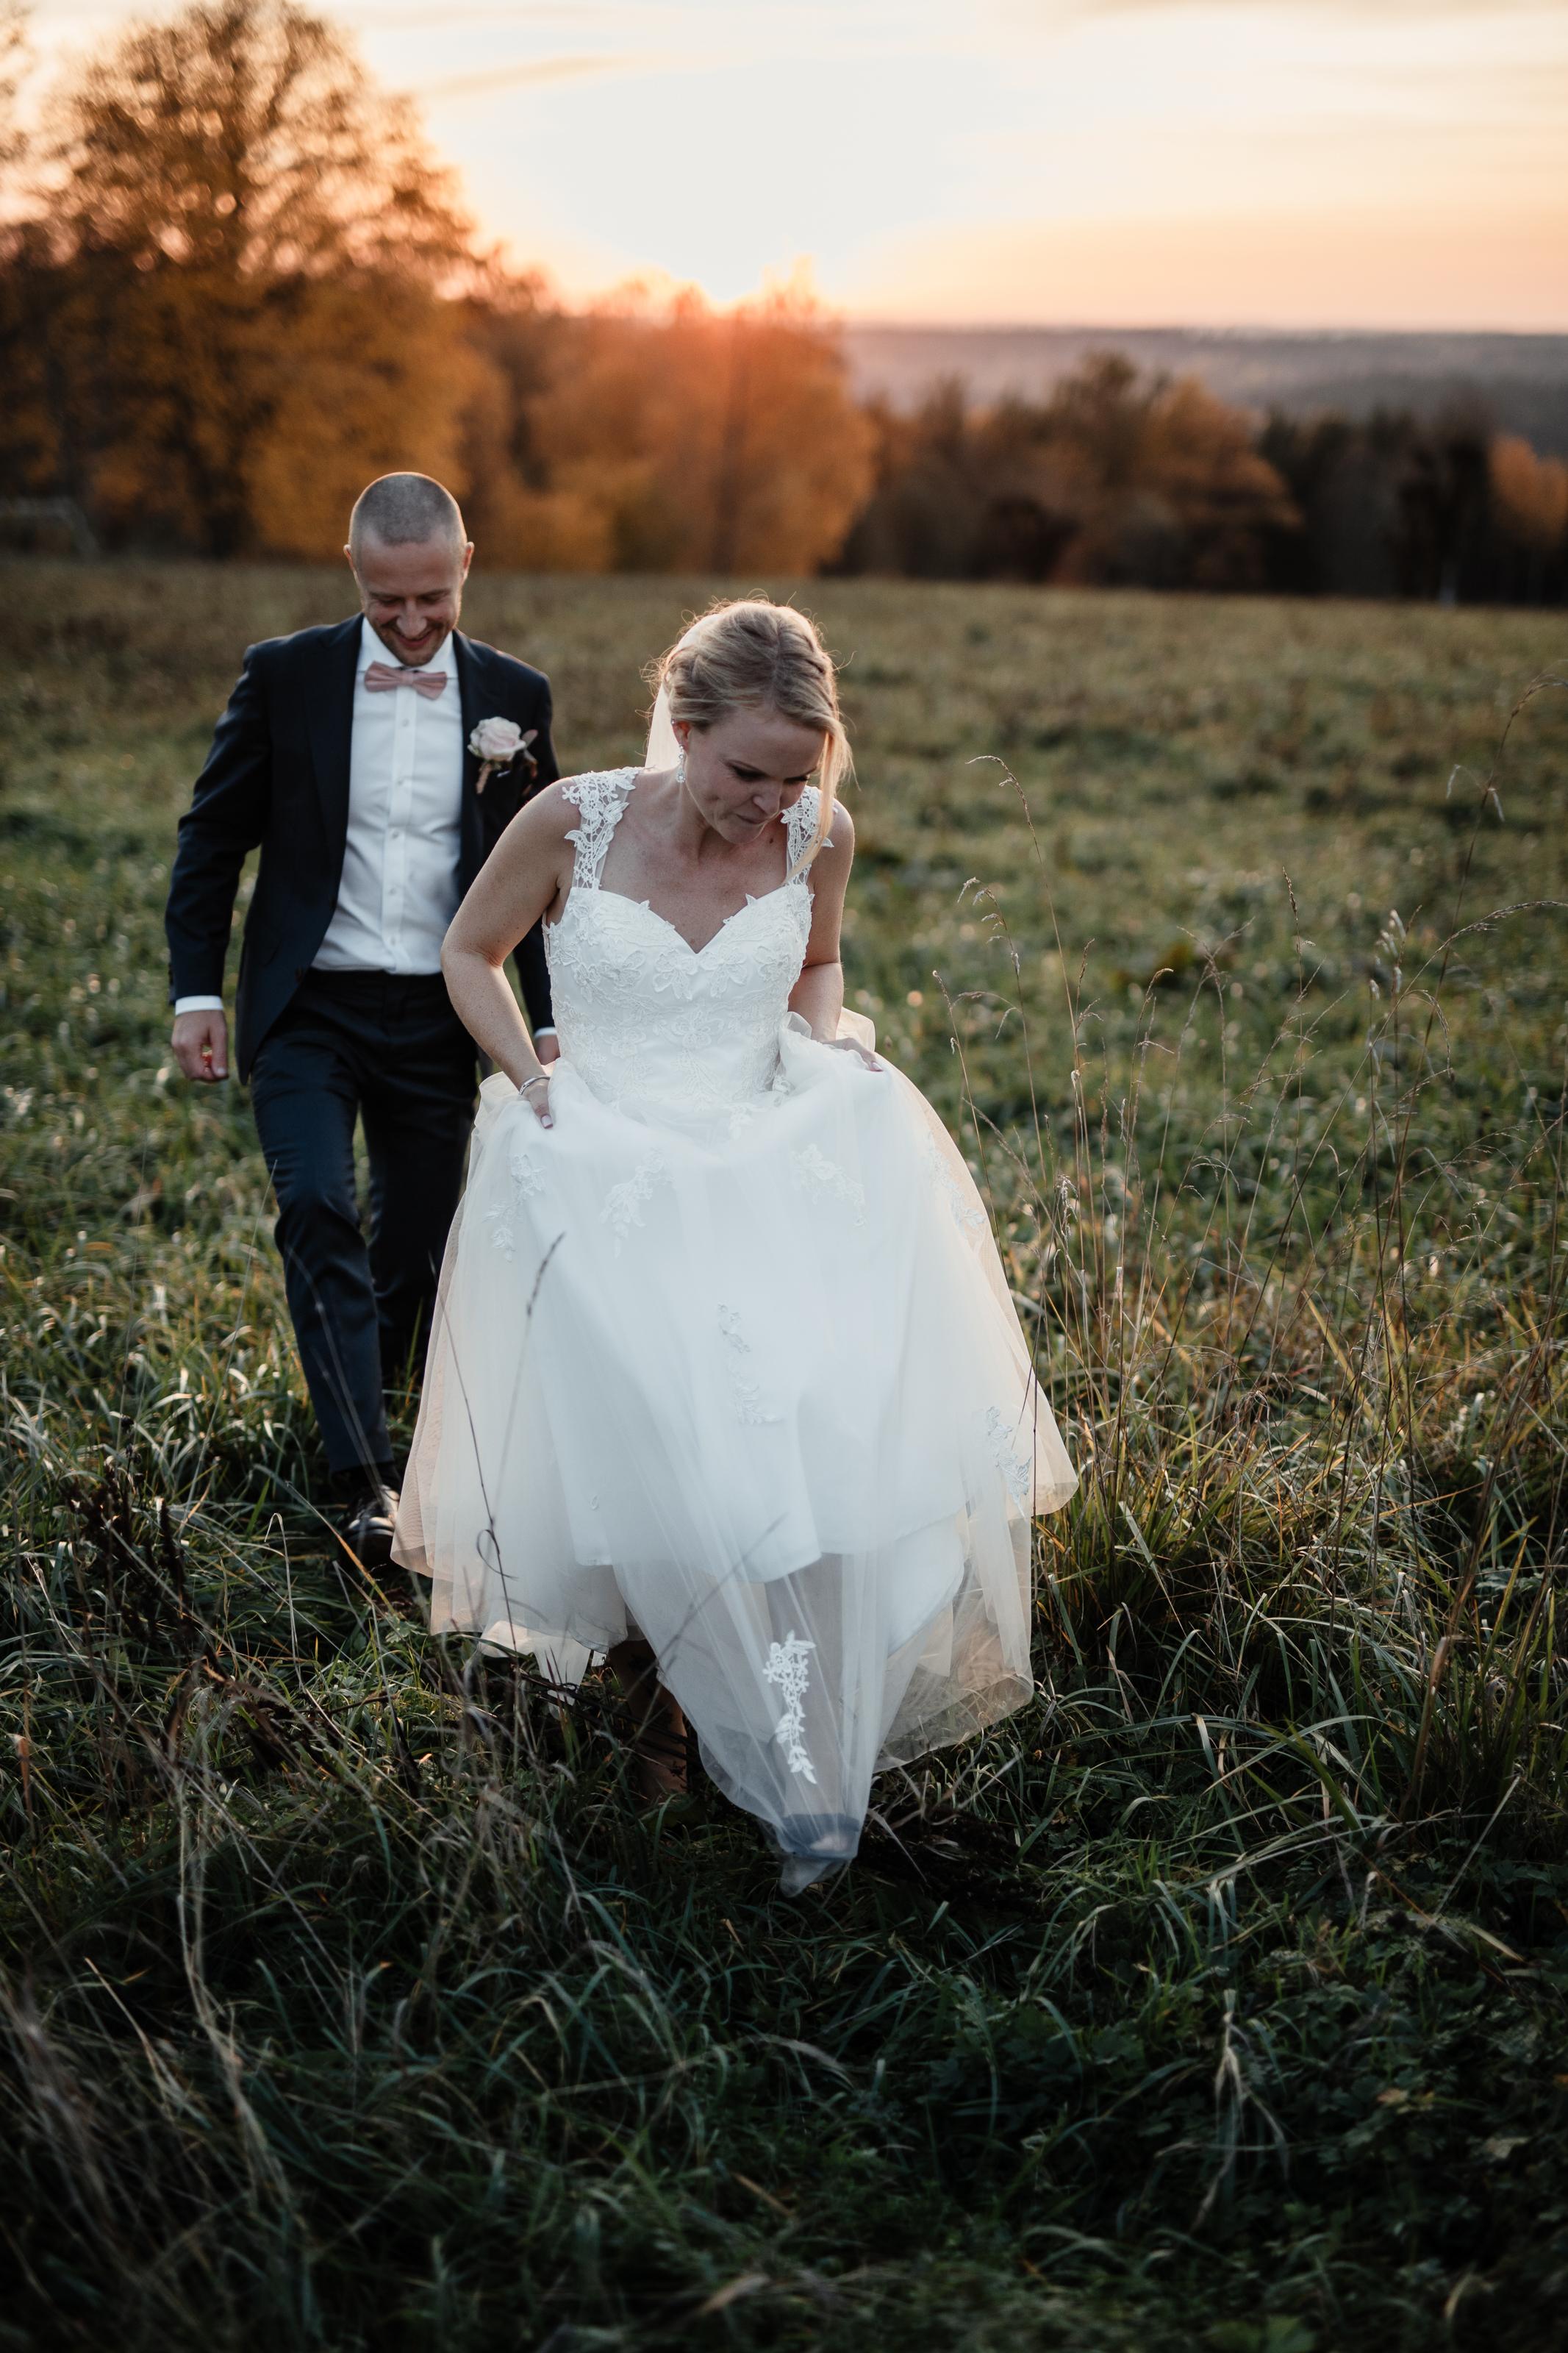 Bröllopsfotograf-Uddetorp Säteri-Höstbröllop-Fotograf Emilia- Bröllopsfotograf Borås-64.jpg